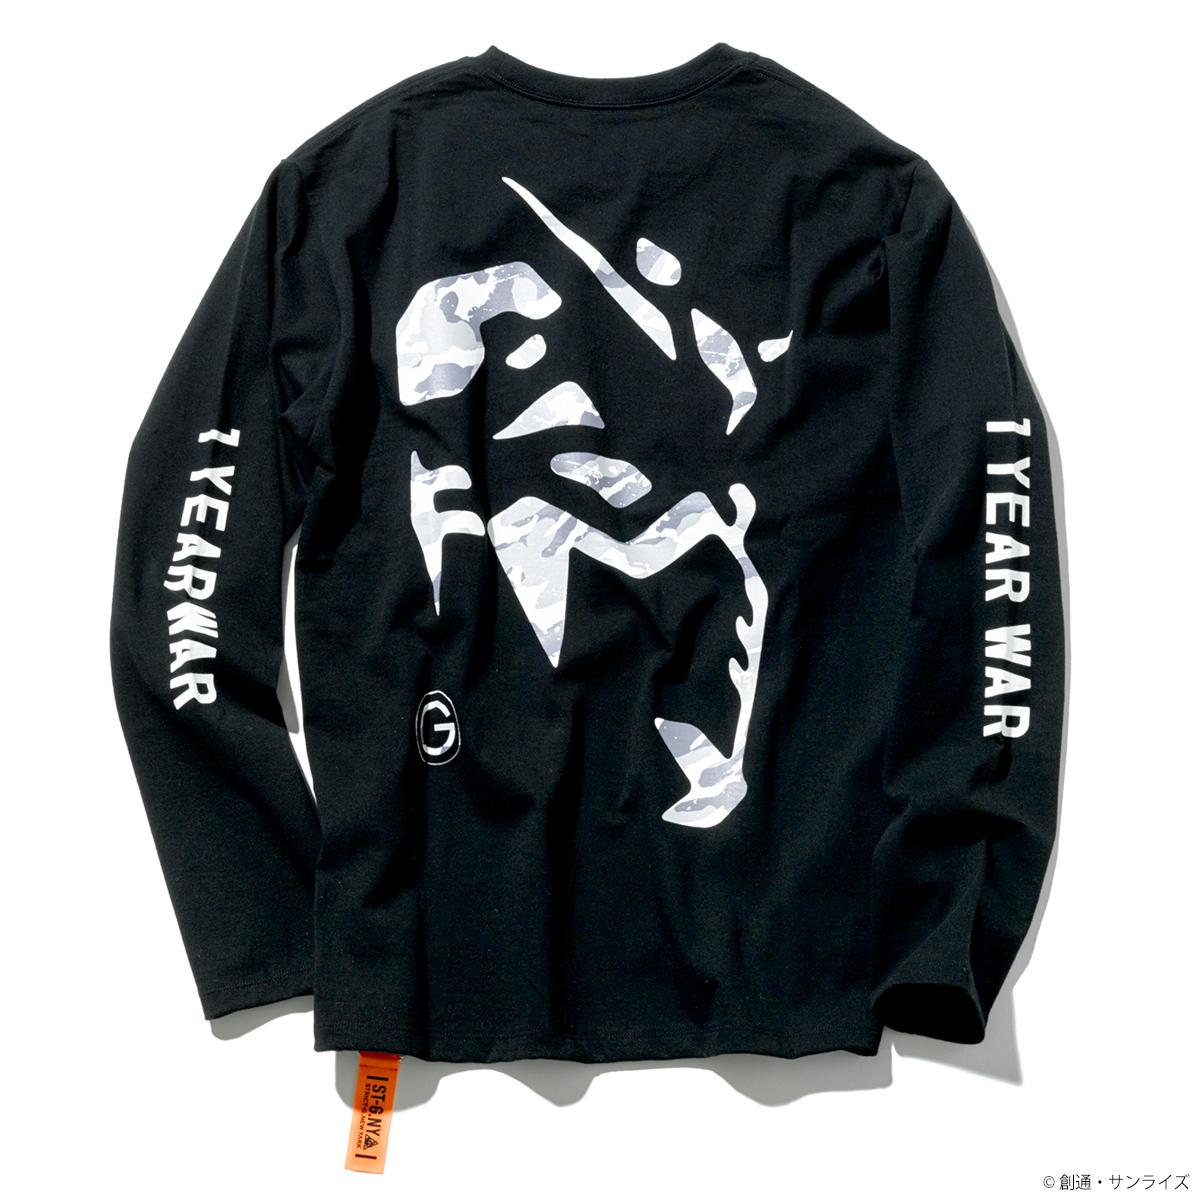 STRICT-G NEW YARK ロングスリーブTシャツ 1 YEAR WAR